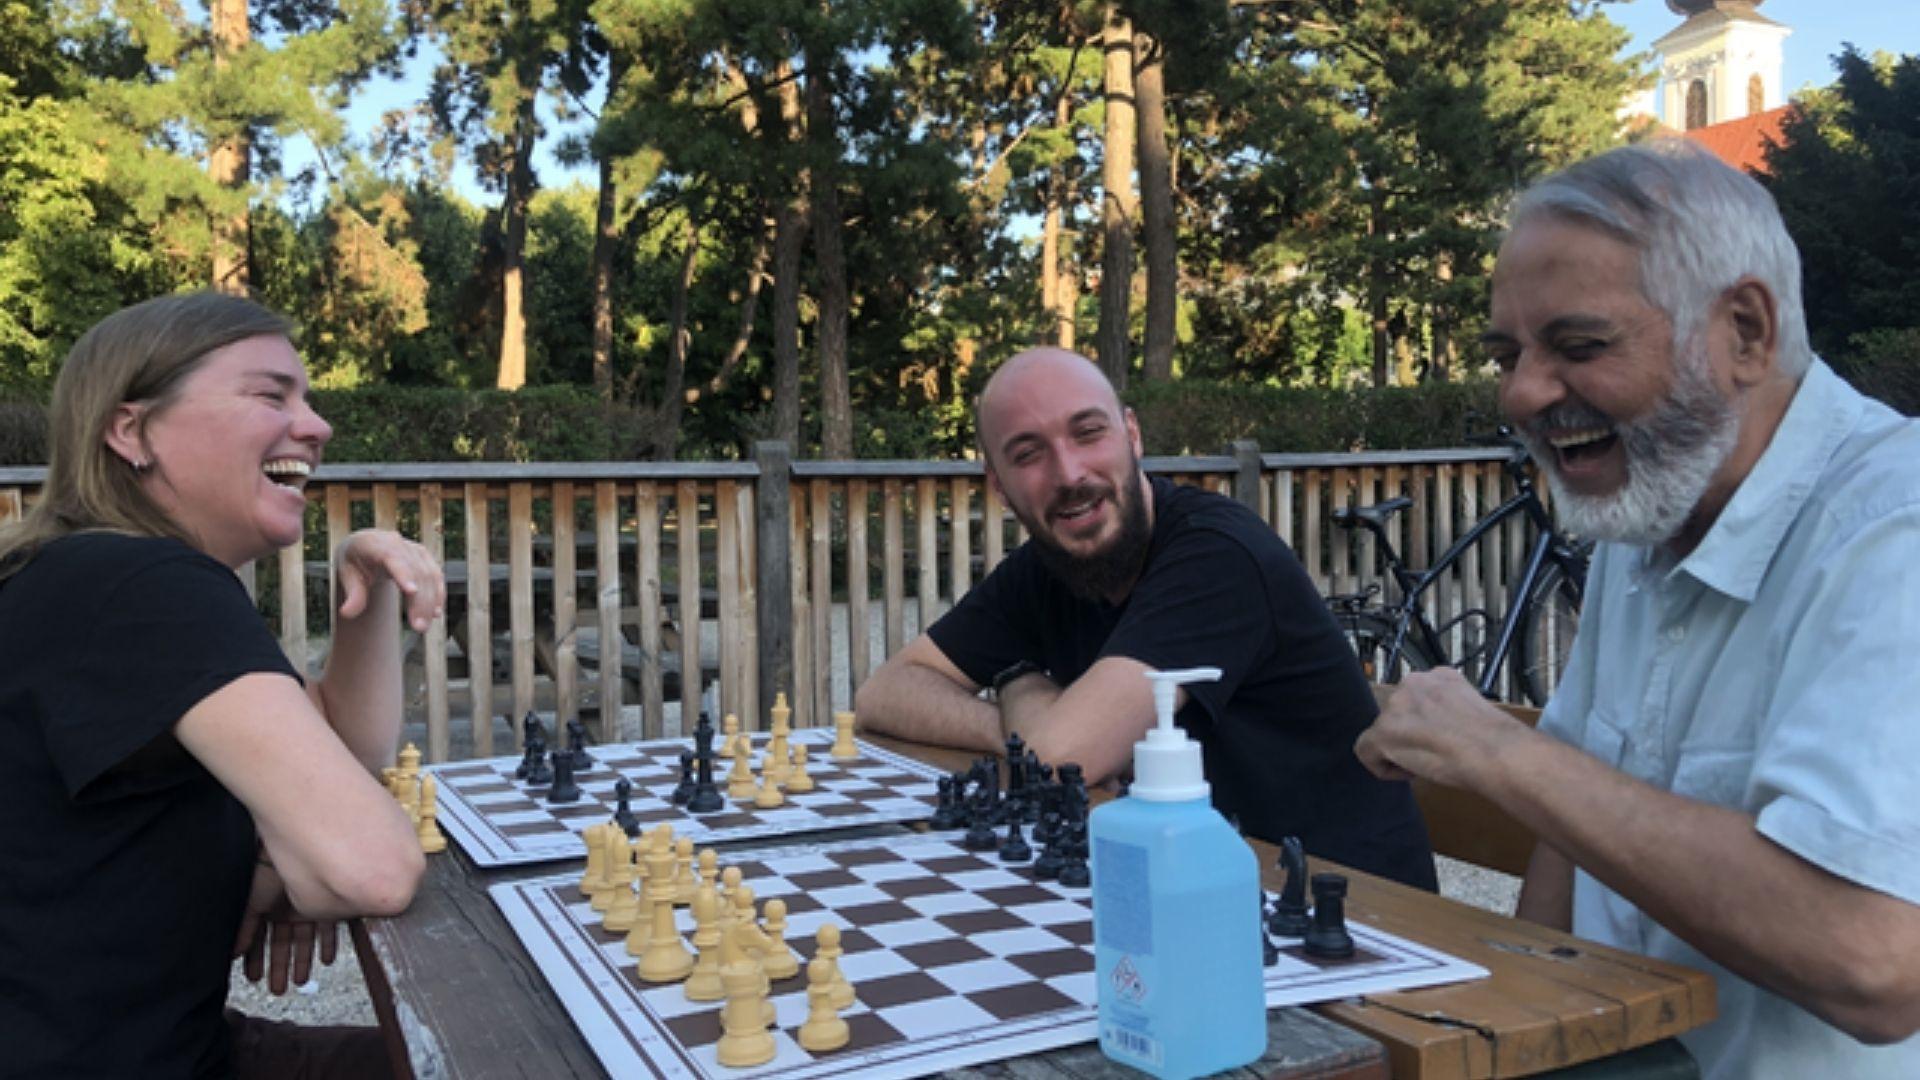 Montags: Online Schachsalon